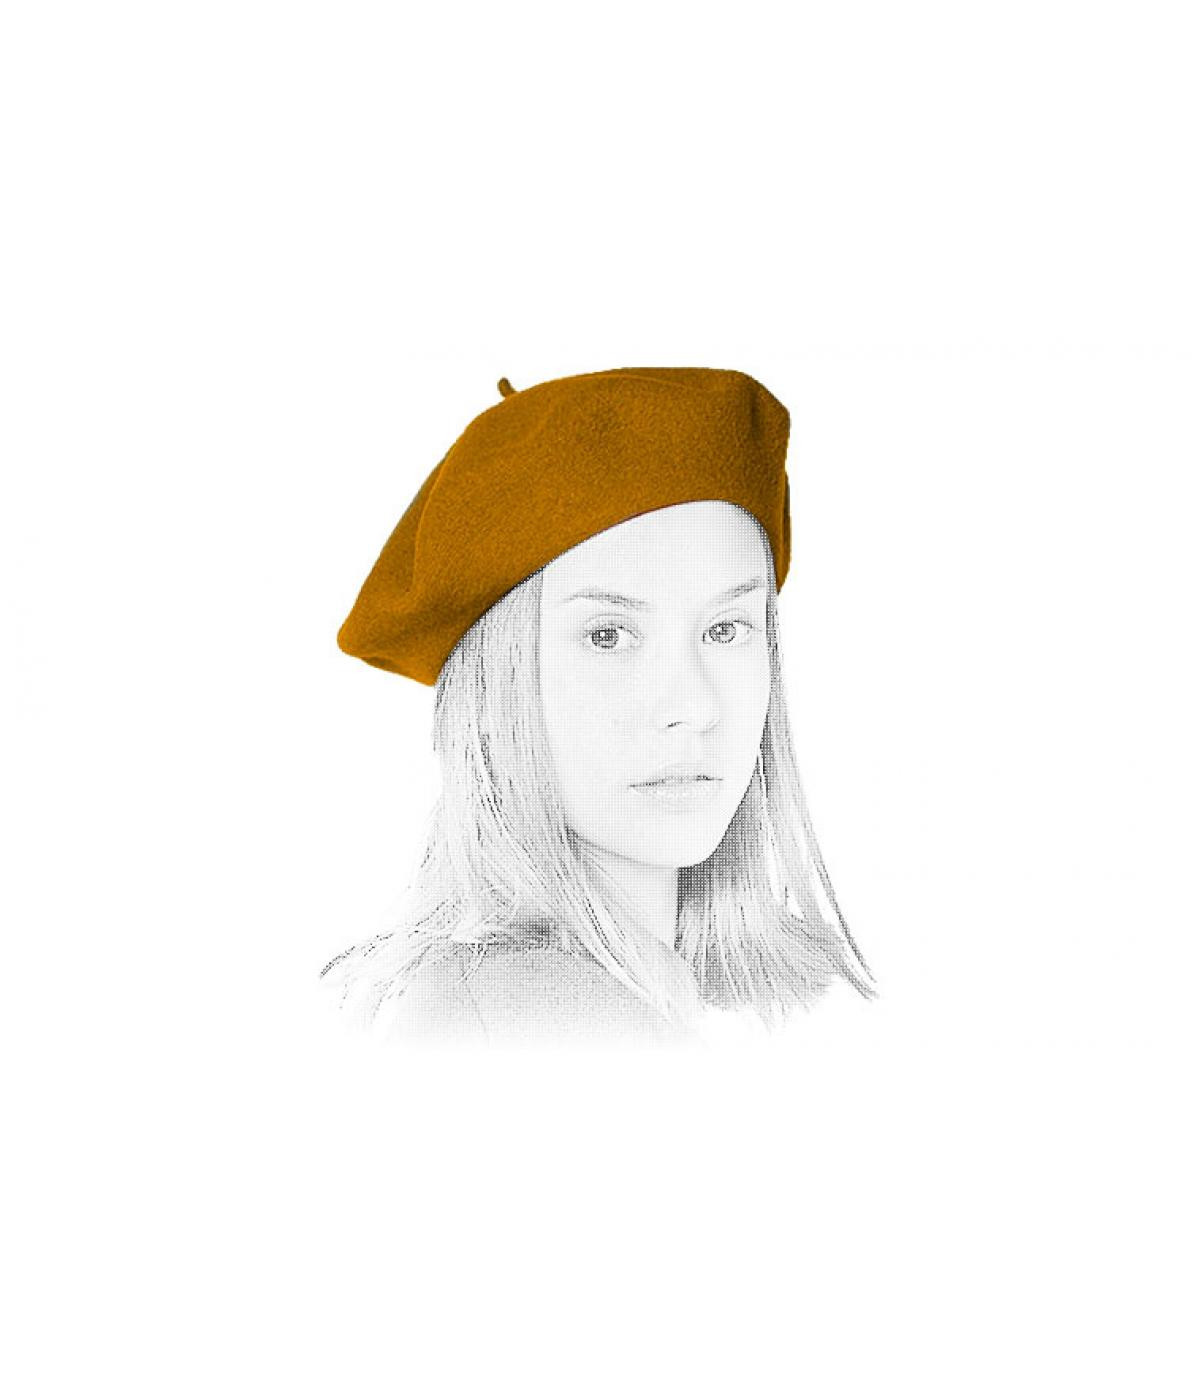 mustard flat cap Laulhère